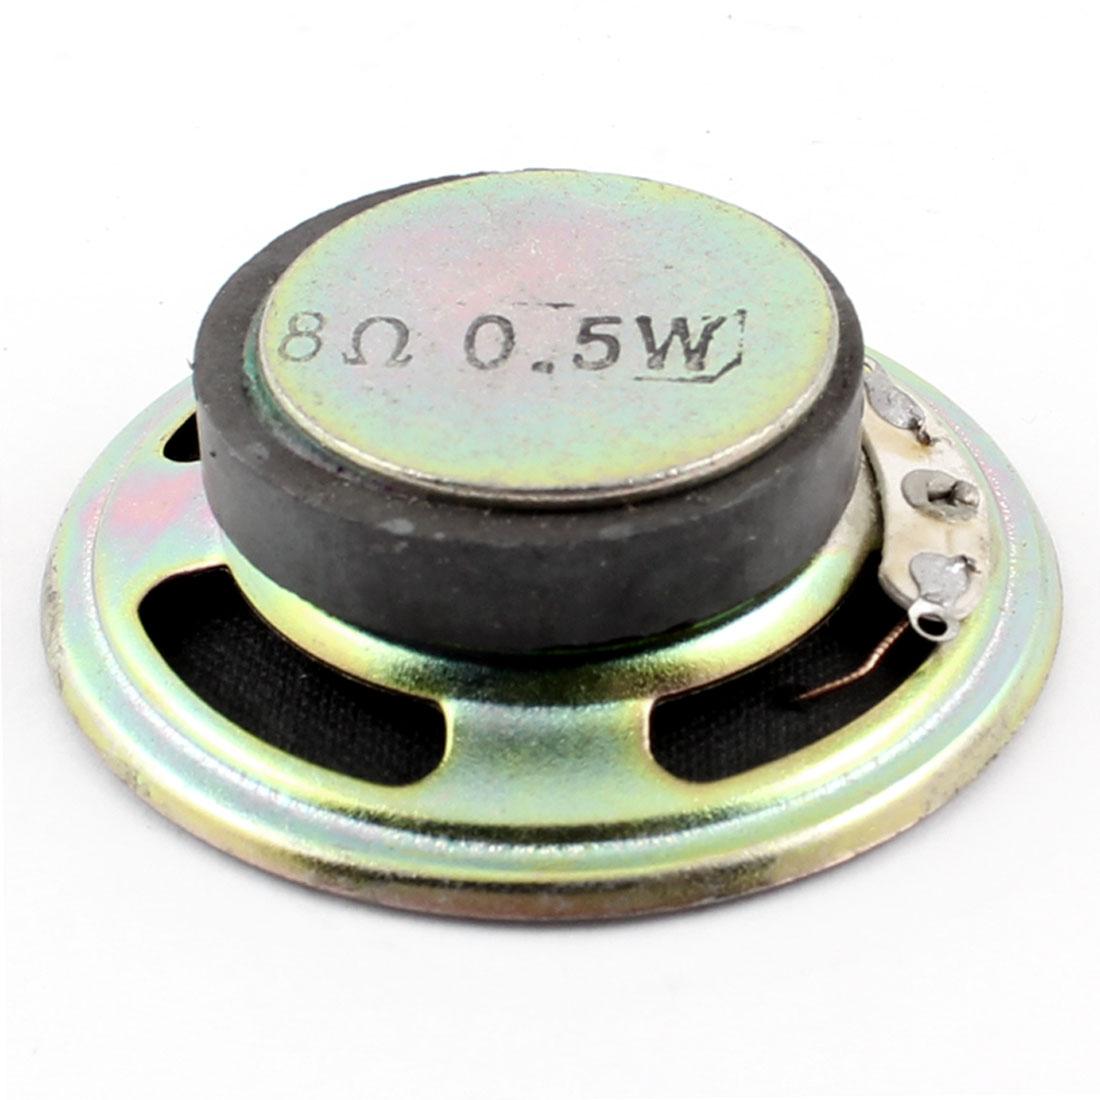 Replacement Part 50mm Diameter Round Internal Magnet Speaker 8 Ohm 0.5W